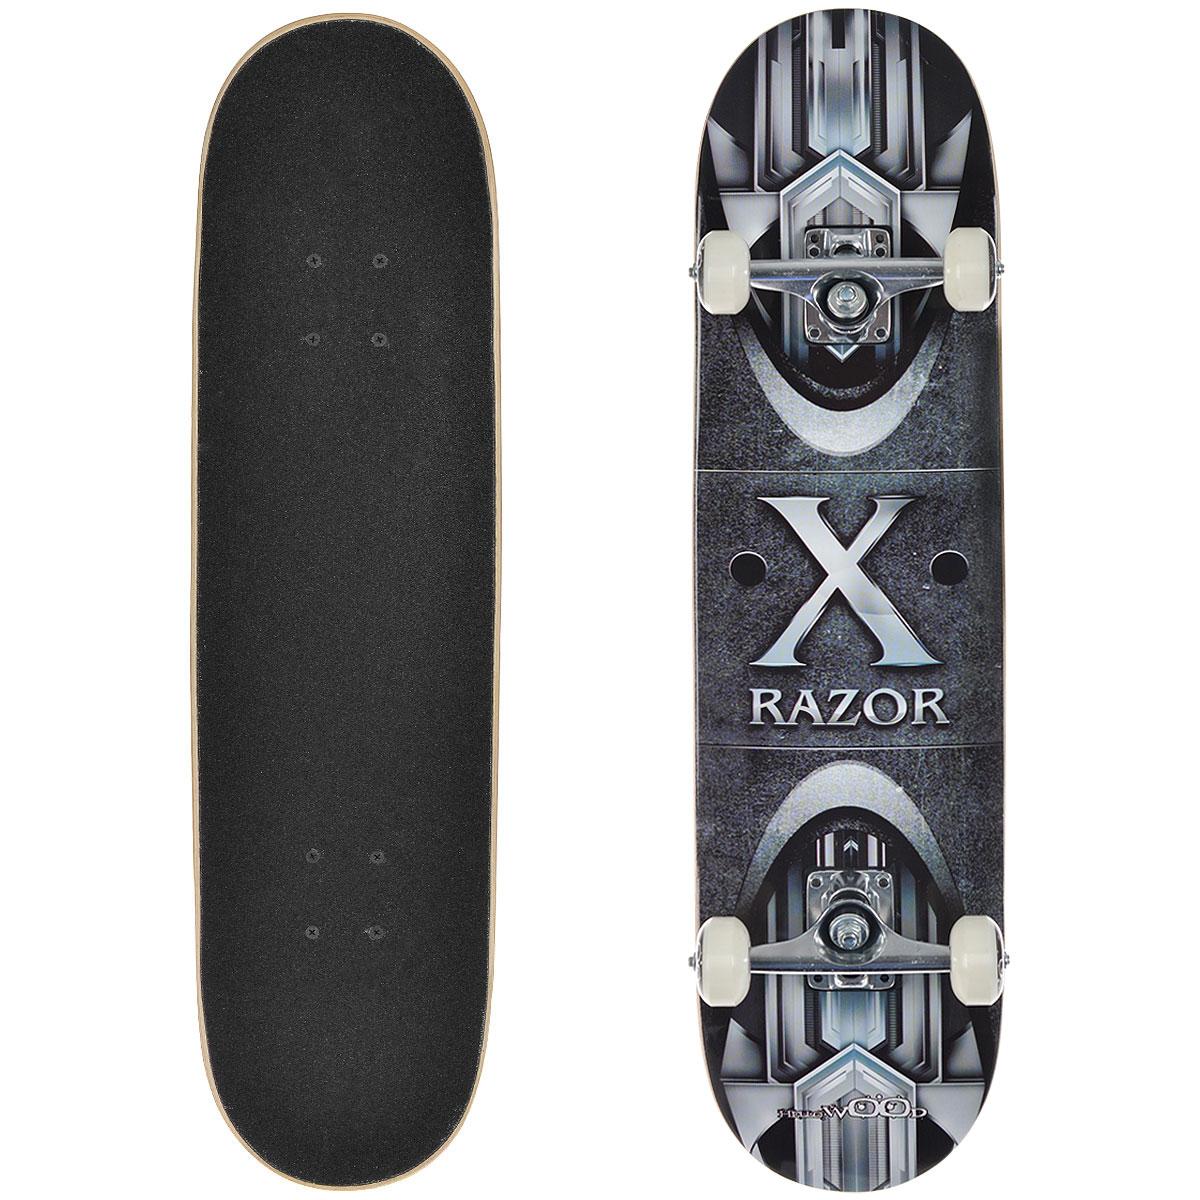 "Скейтборд HelloWood ""Razor"", дека 79 см х 20 см HW RAZOR"